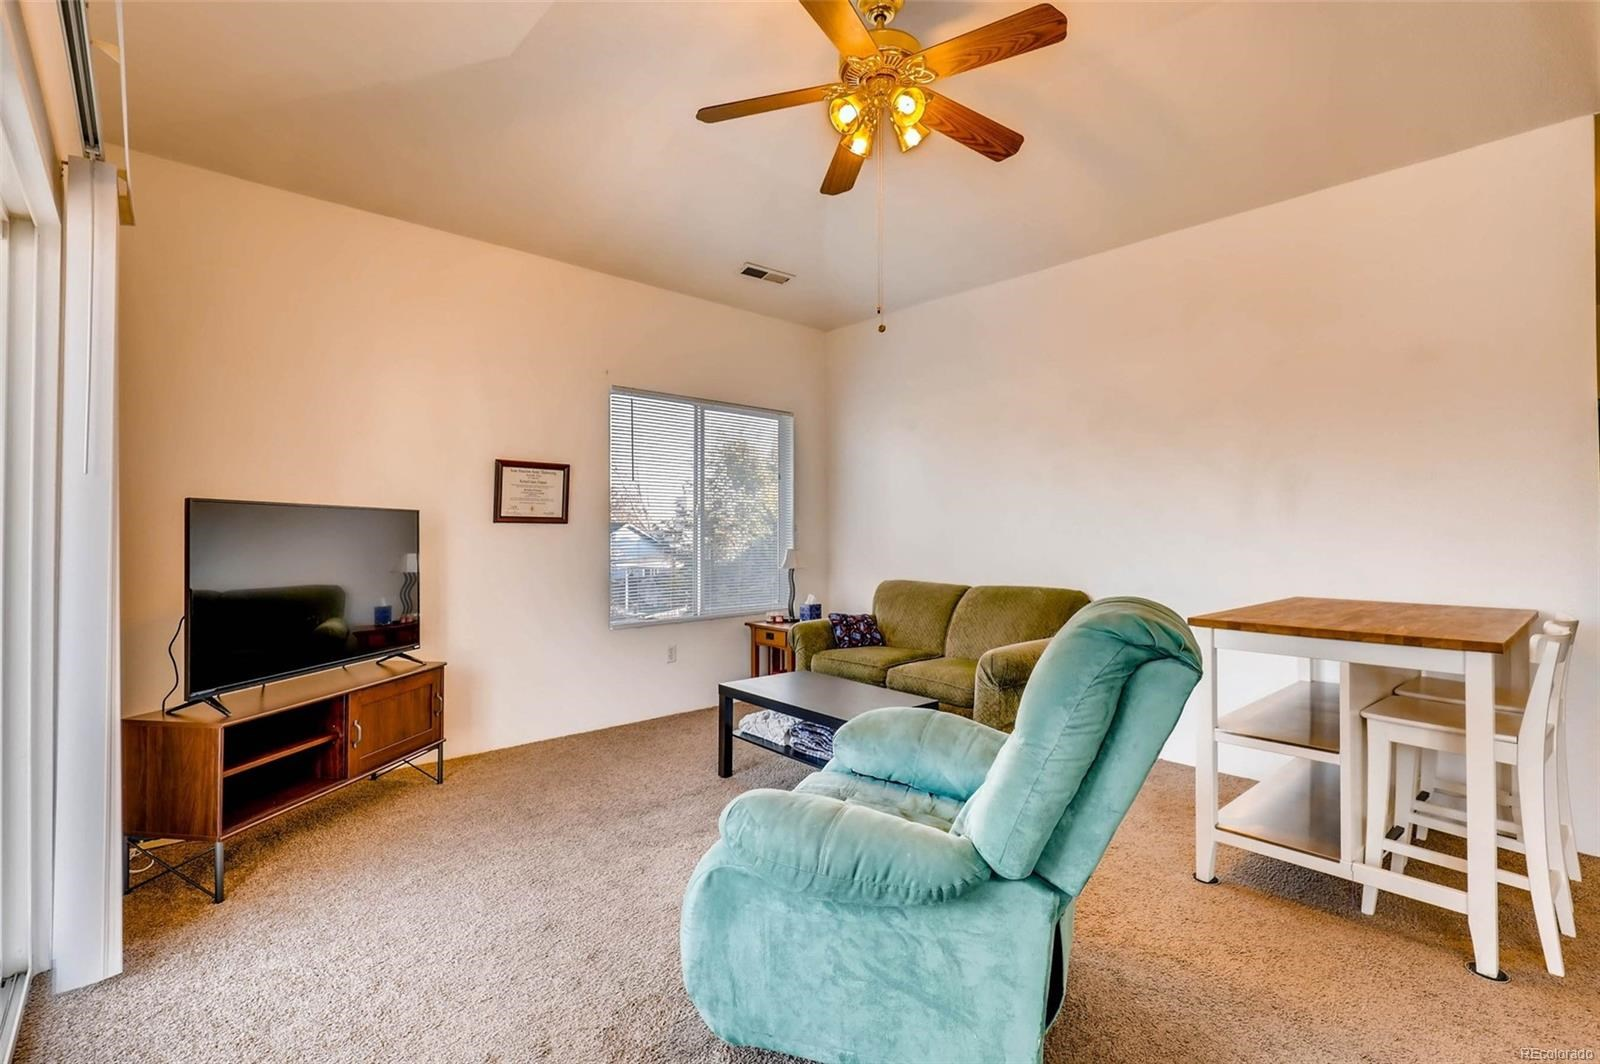 MLS# 9808696 - 11 - 2049 Legacy Ridge View, Colorado Springs, CO 80910